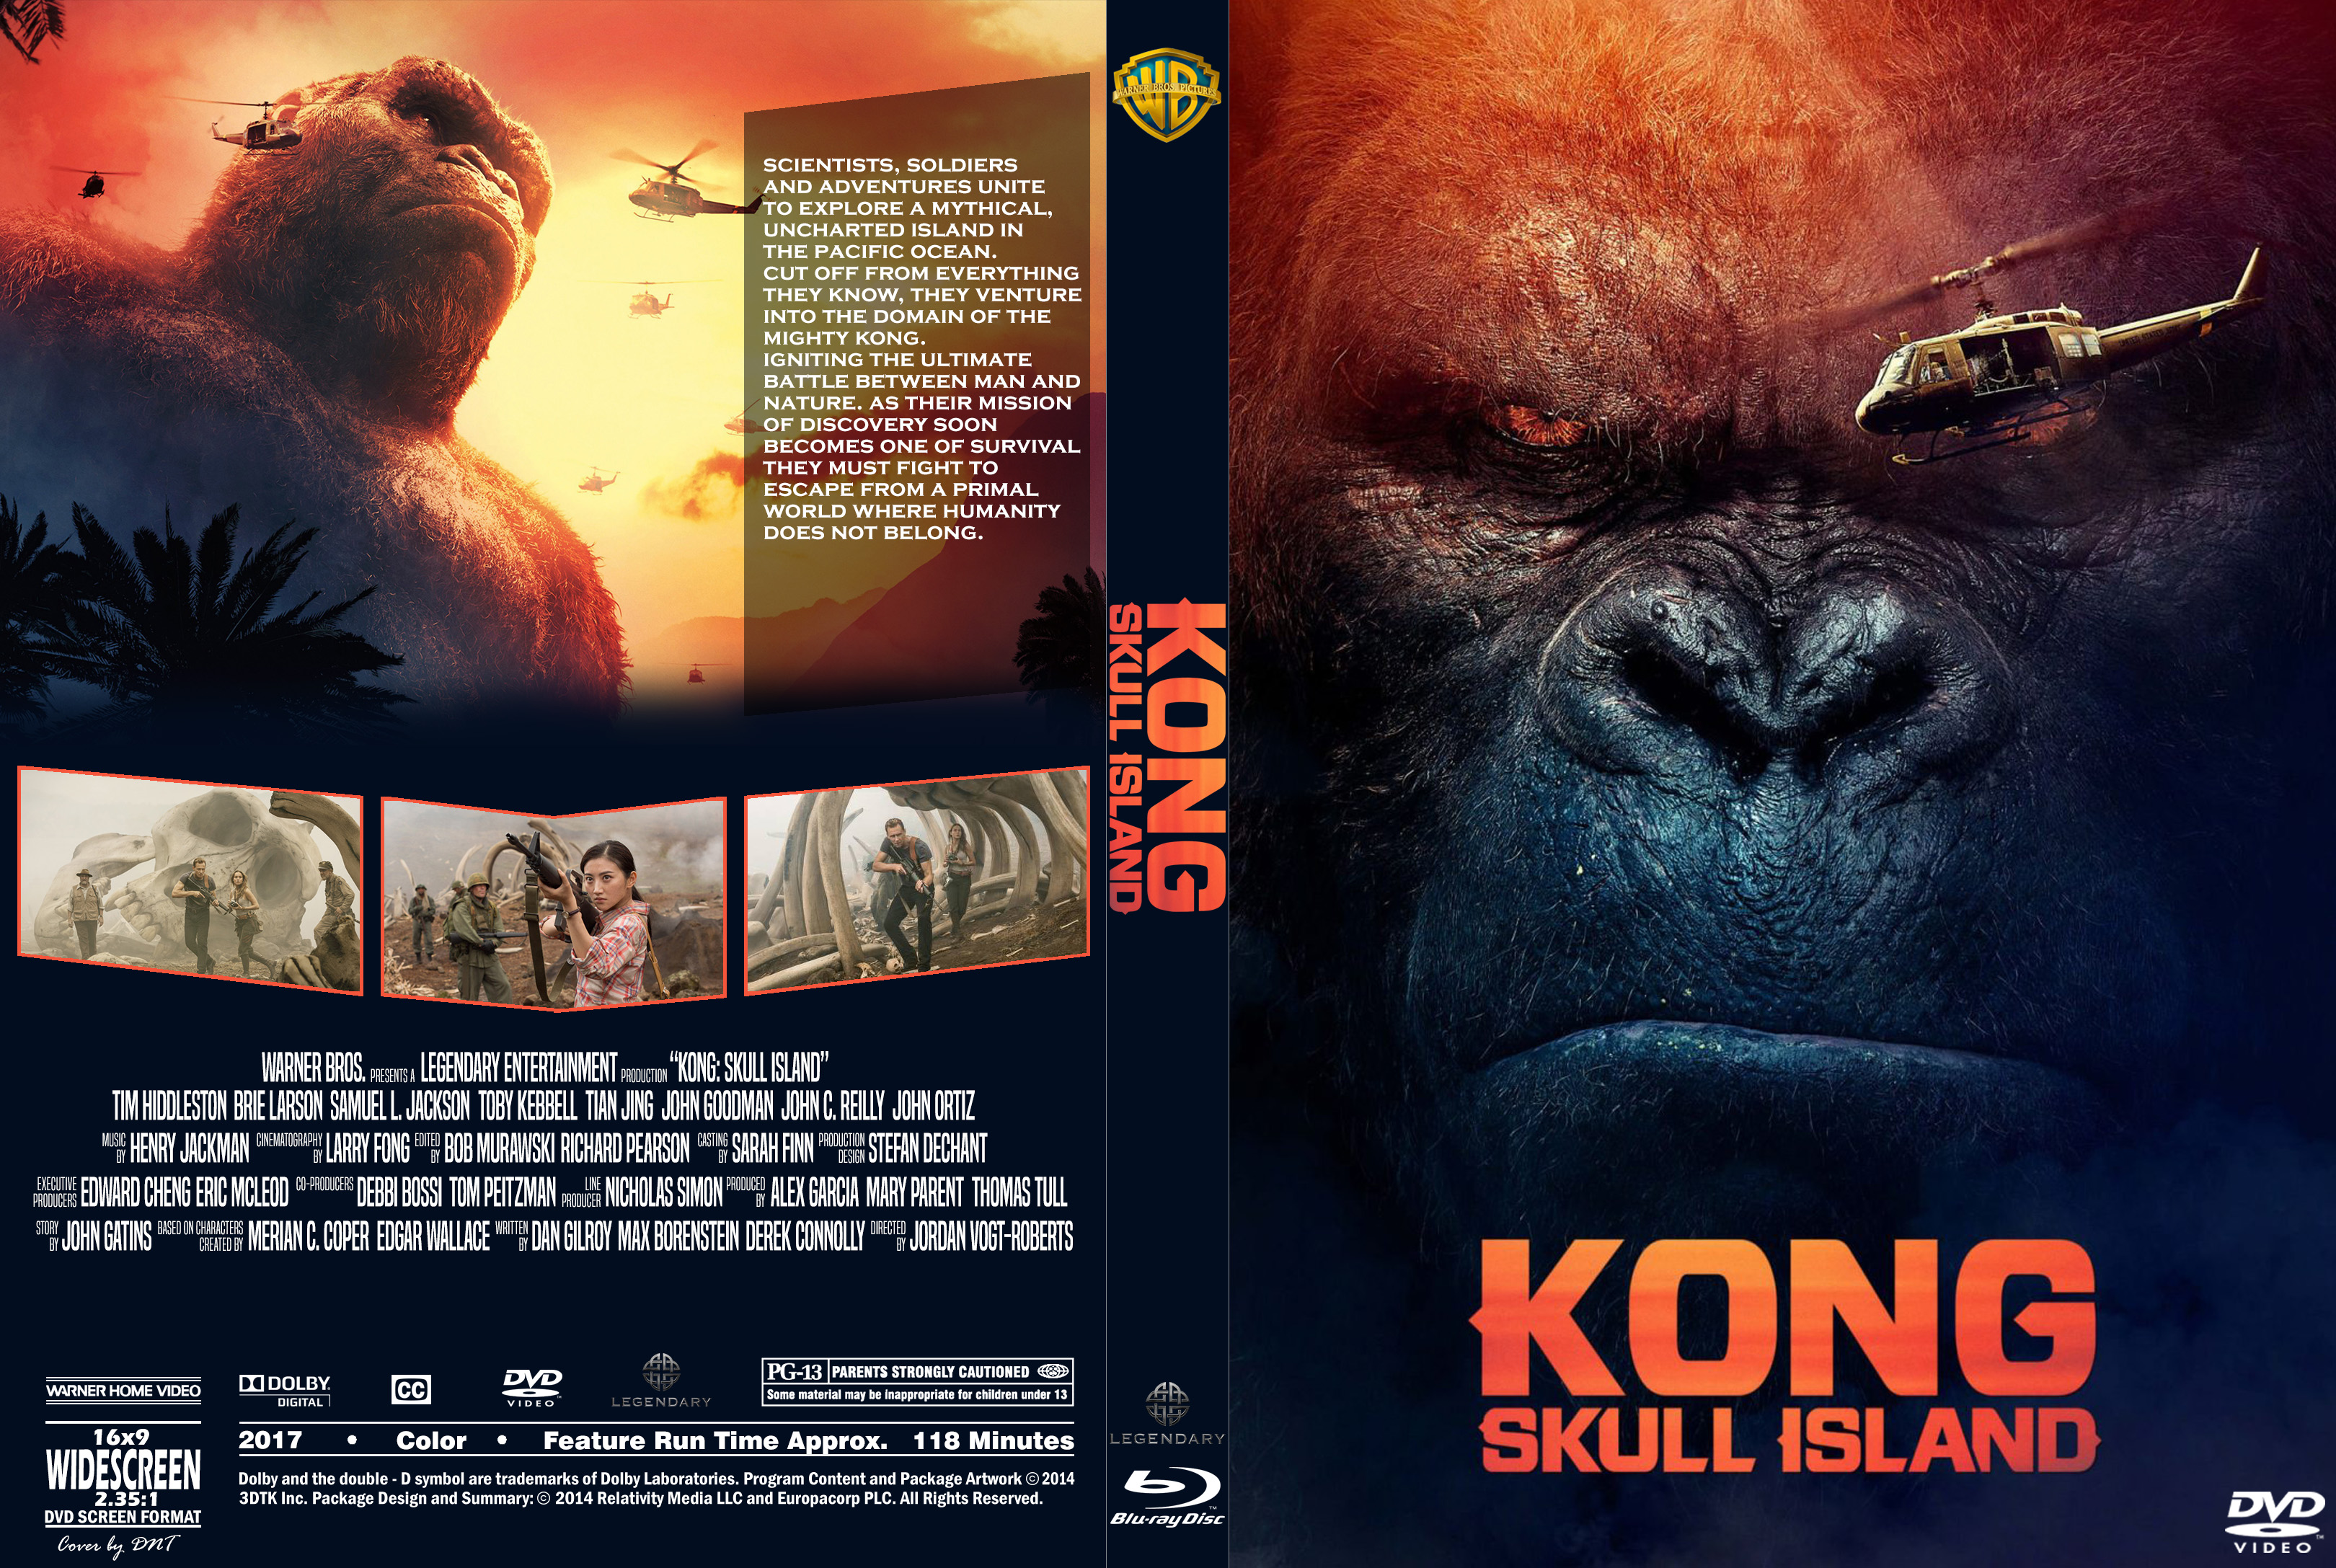 Covers Box Sk Kong Skull Island 2017 High Quality Dvd Blueray Movie